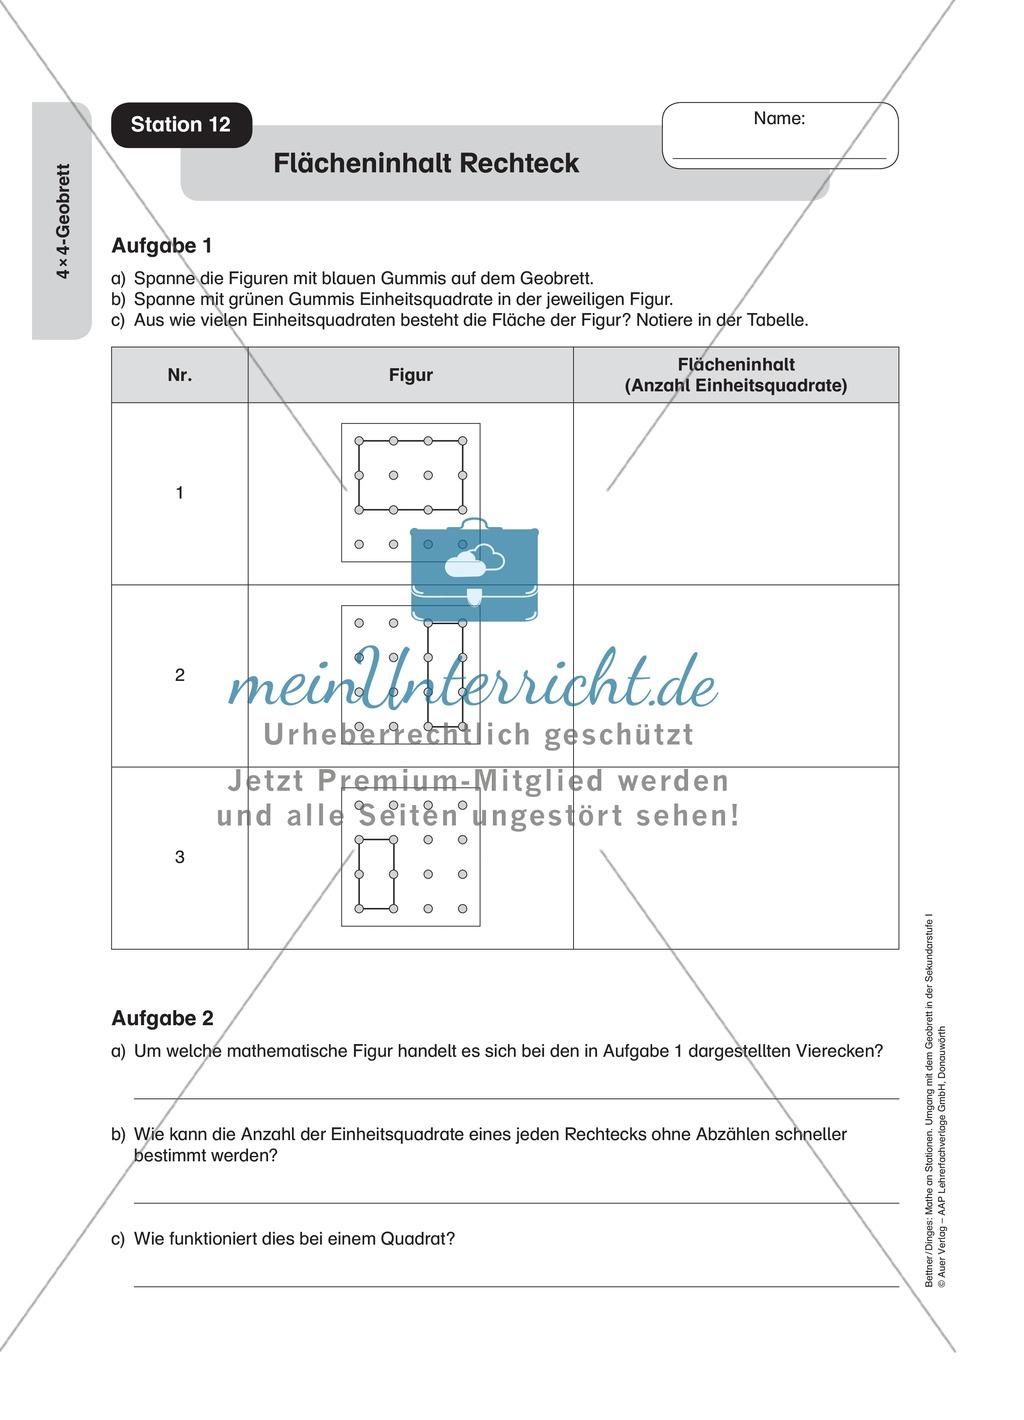 Schön Quadrate Und Quadratwurzeln Arbeitsblatt Galerie - Super ...